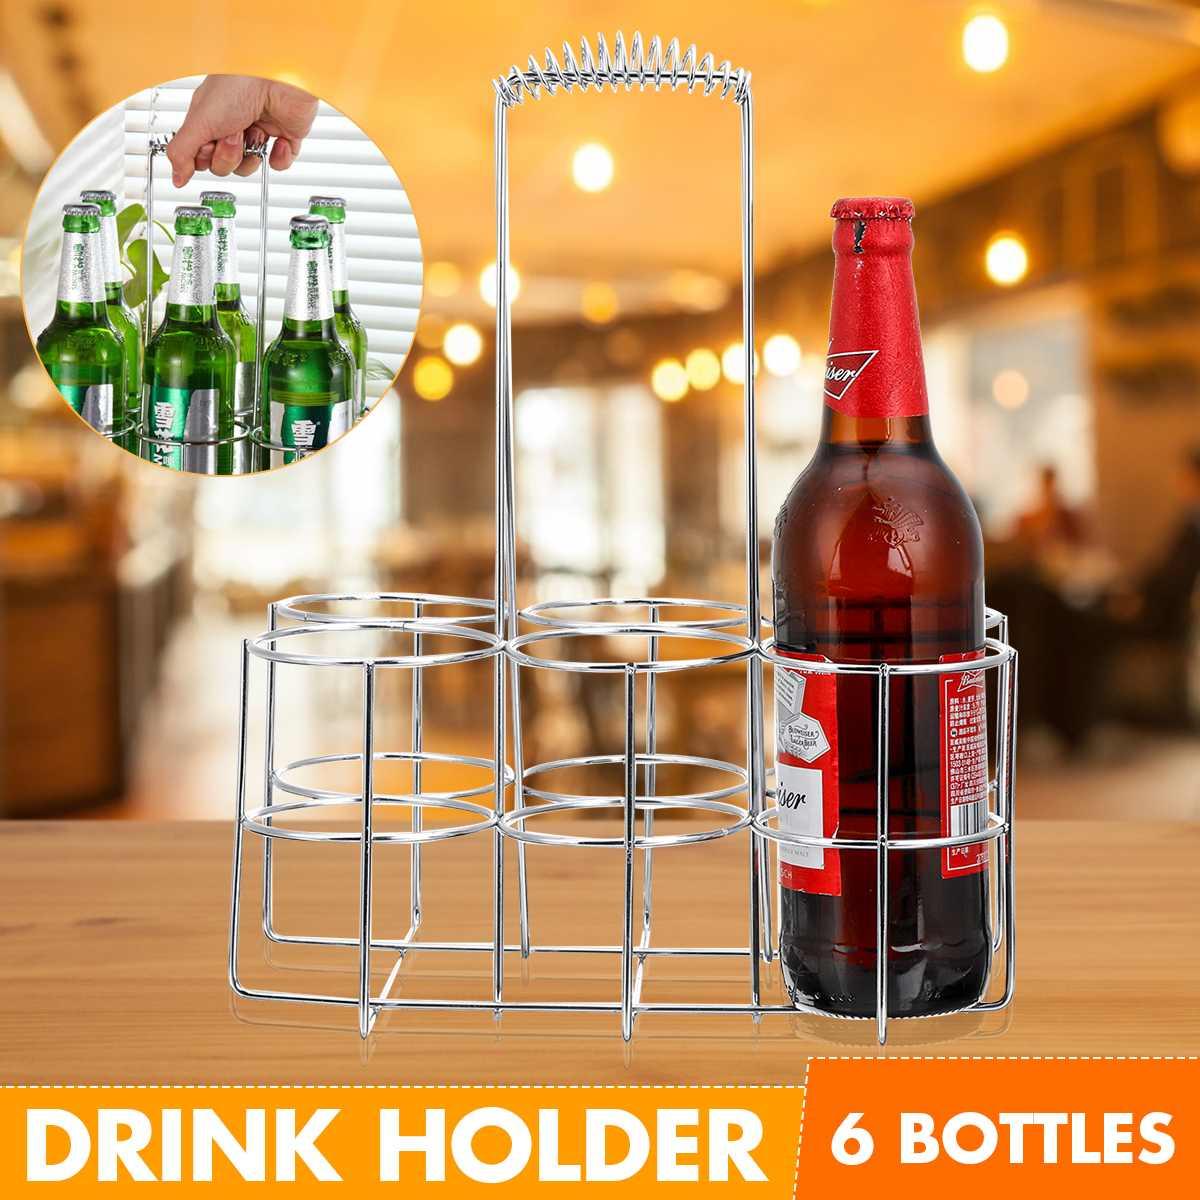 Estante portátil para vino, cesta de 6 botellas, soporte de Metal Vintage para vino, estante pequeño para vino y estante para botellas de vino